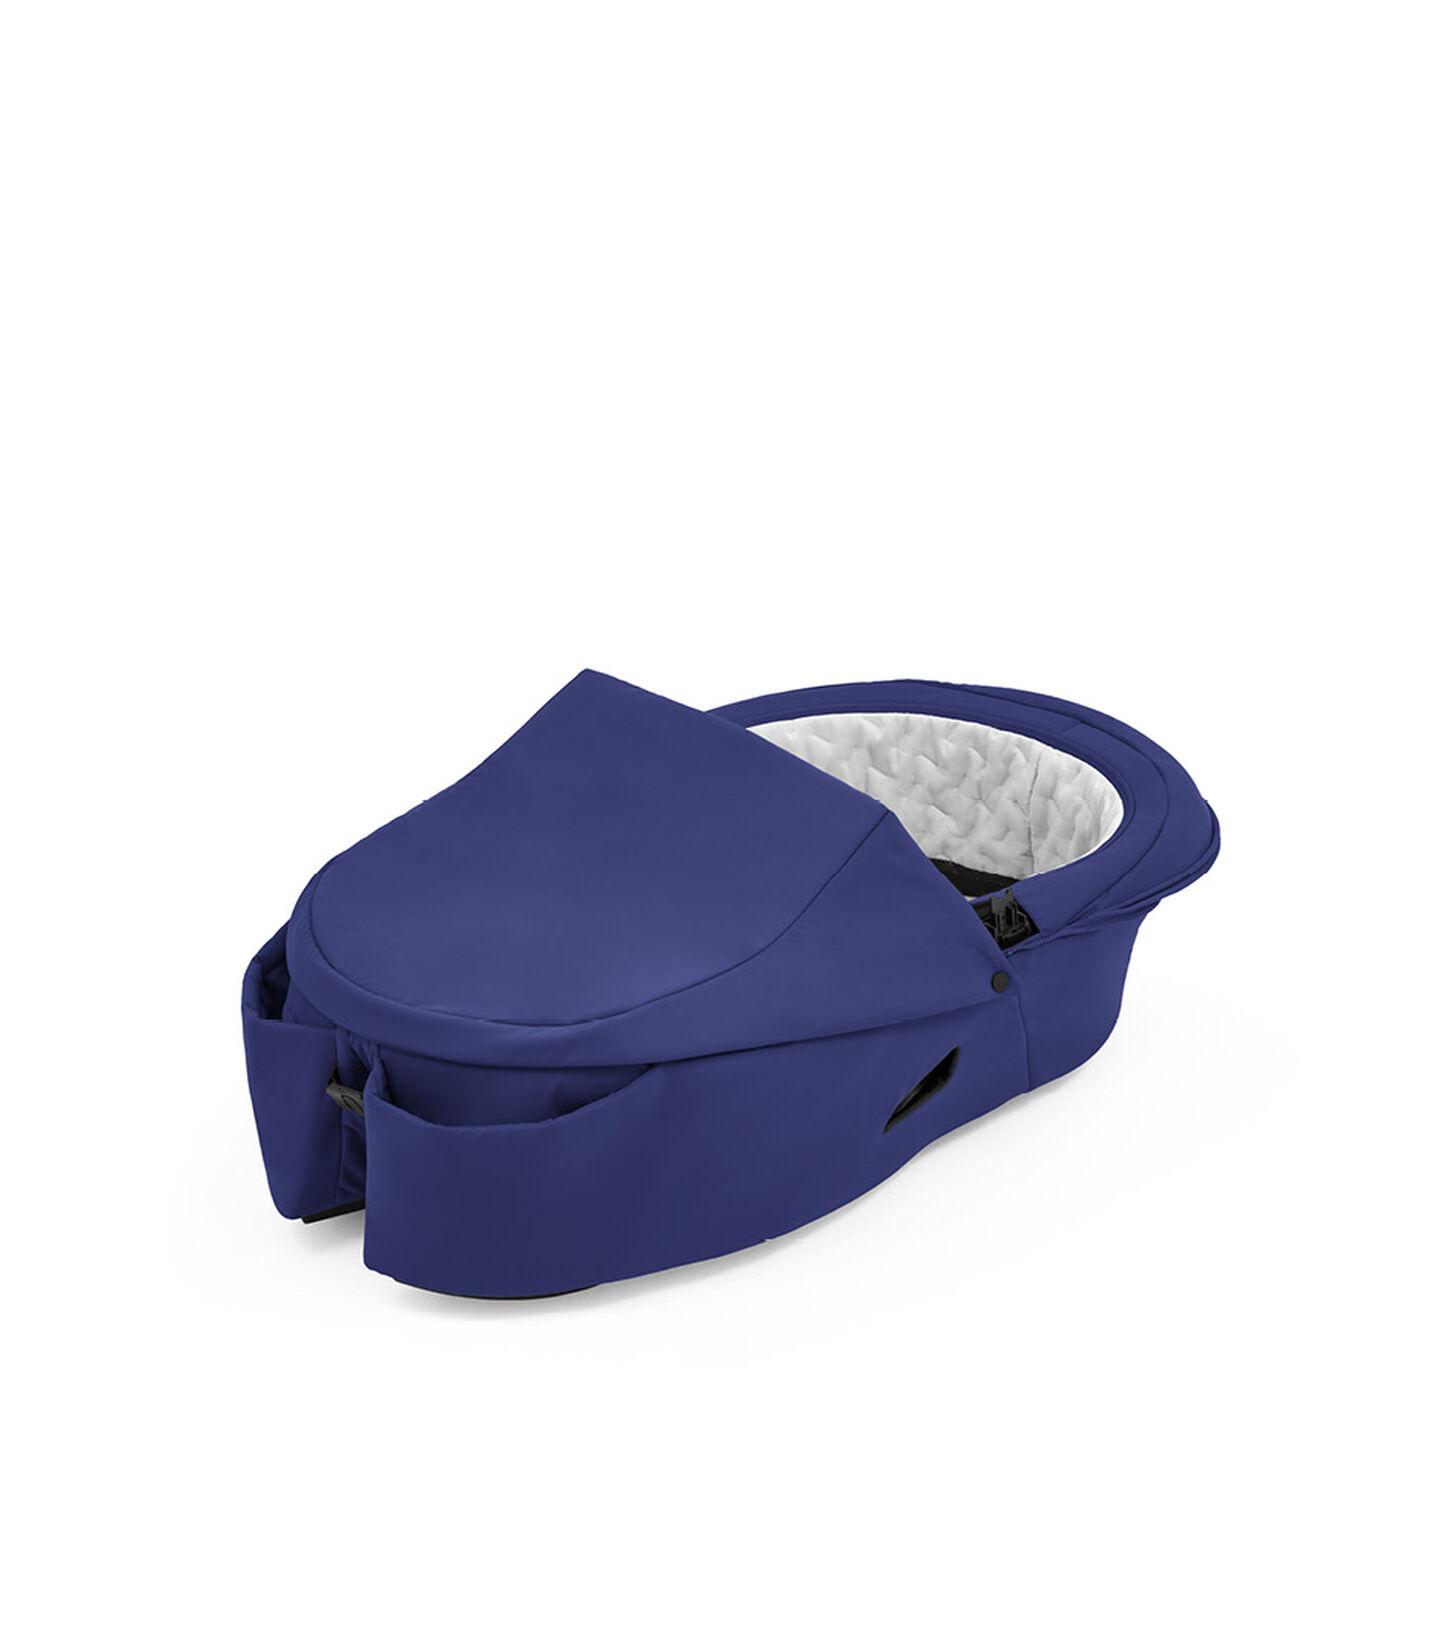 Stokke® Xplory® X Babyschale Royal Blue, Royal Blue, mainview view 1